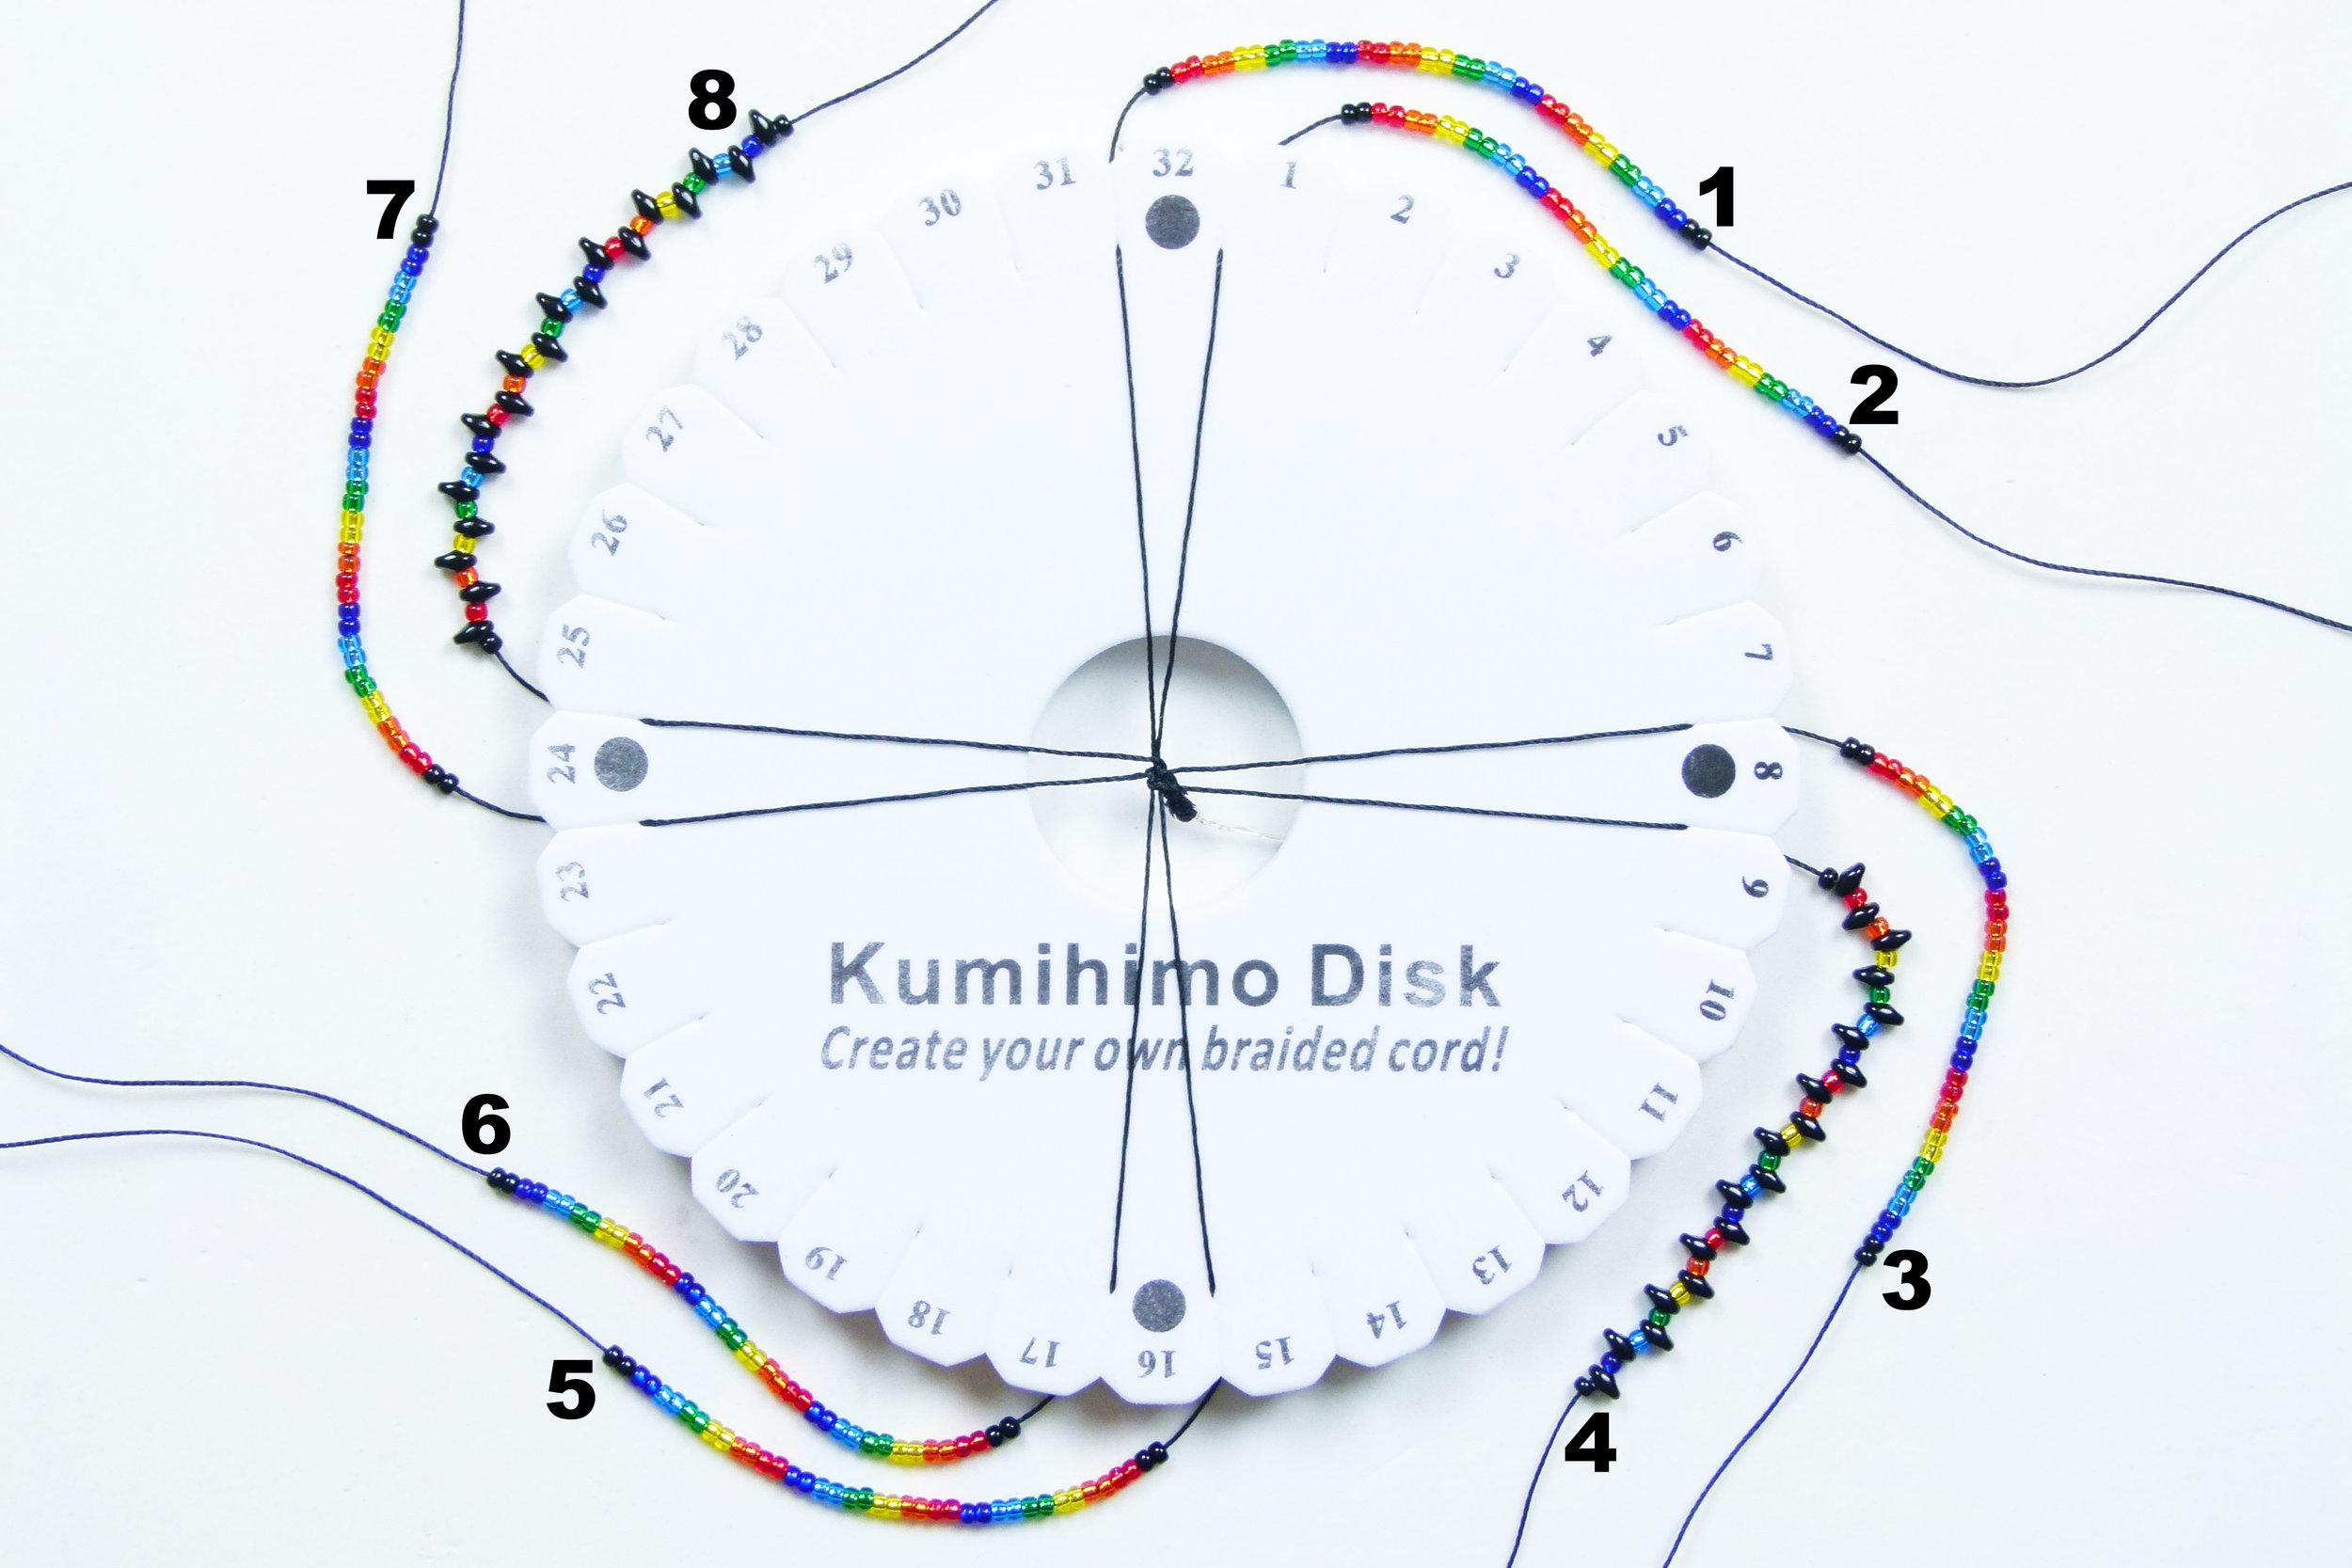 Beaded Kumihimo Tutorials Csldesigns